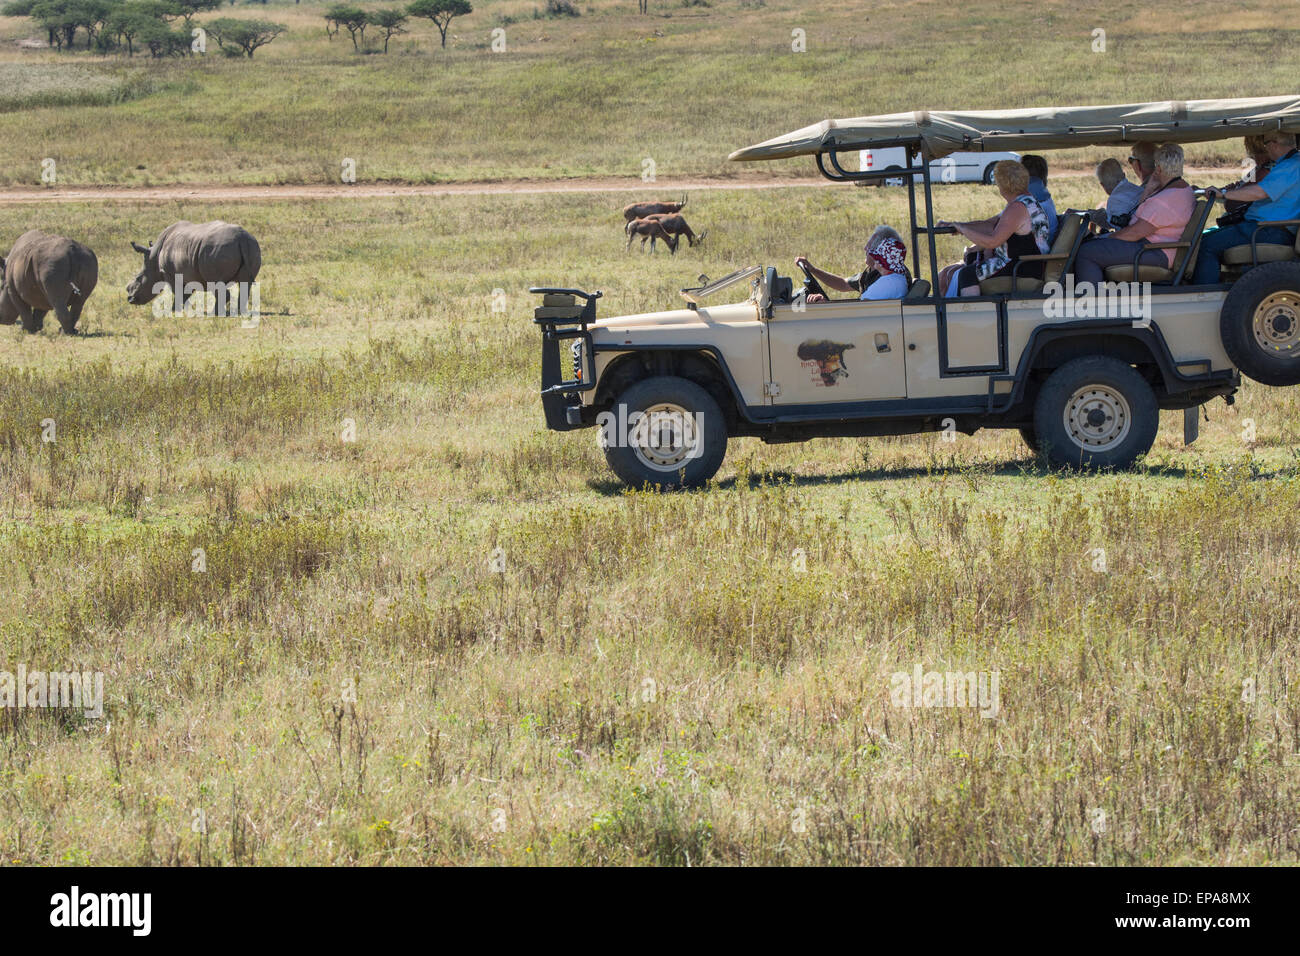 South Africa, Durban. Tala Game Reserve. Tourists in safari jeep watching white rhino (WILD: Ceratotherium simum). - Stock Image